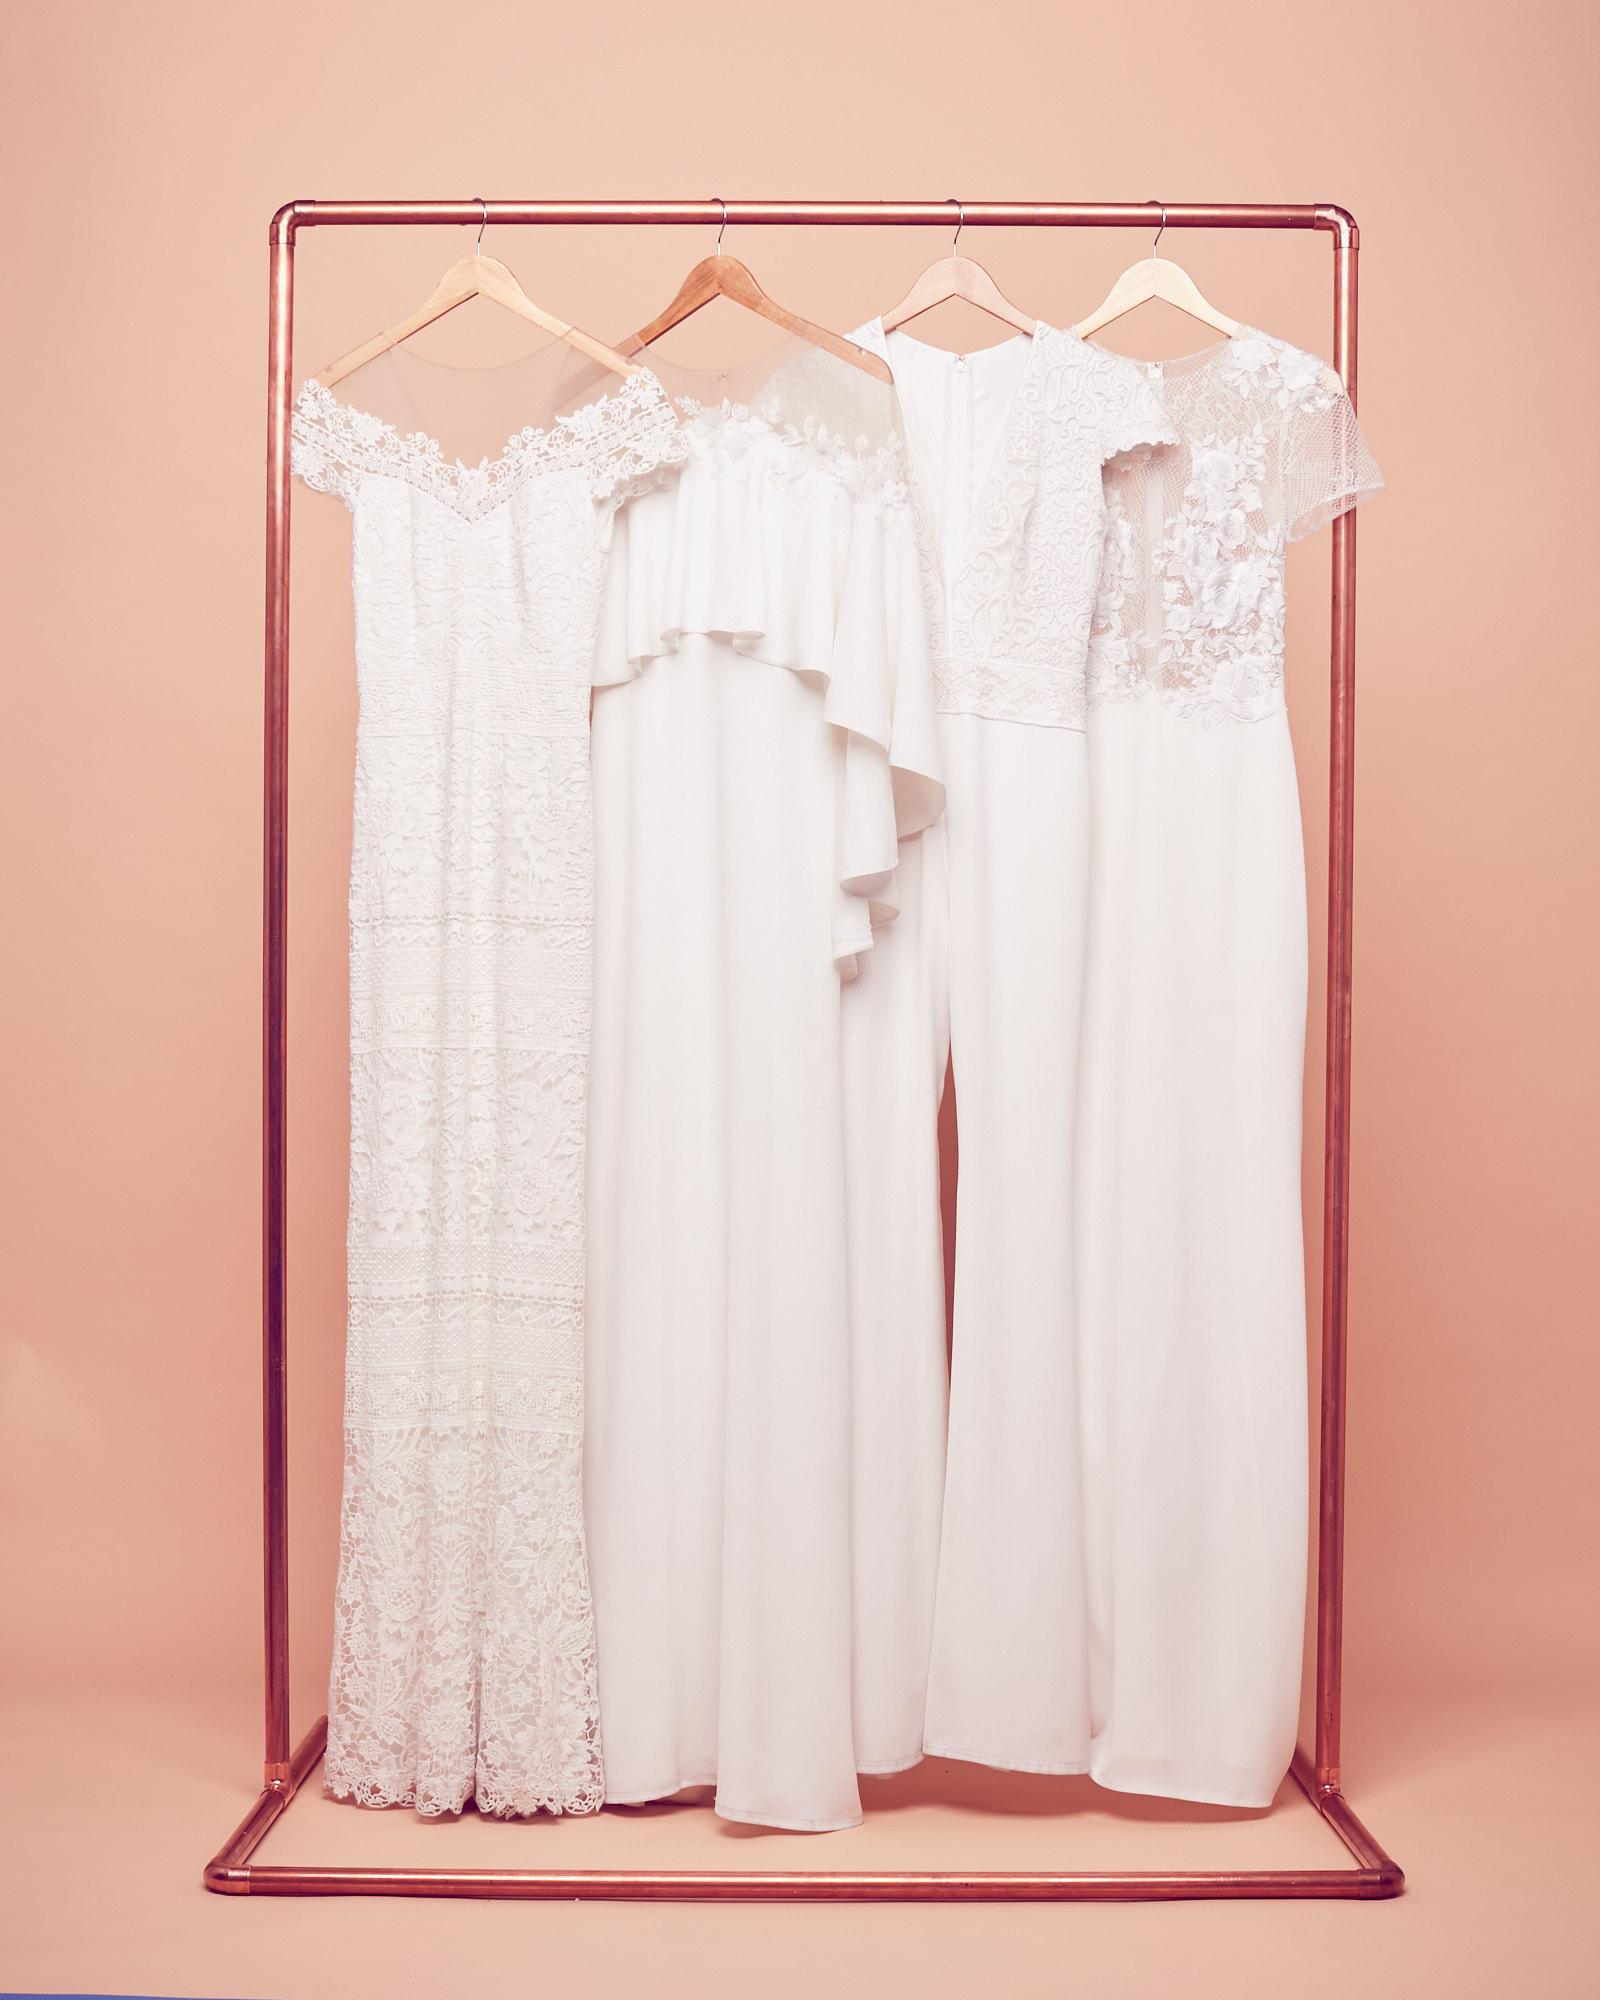 Bohemian wedding dresses hanging on a rack by Tadashi Shoji at David's Bridal